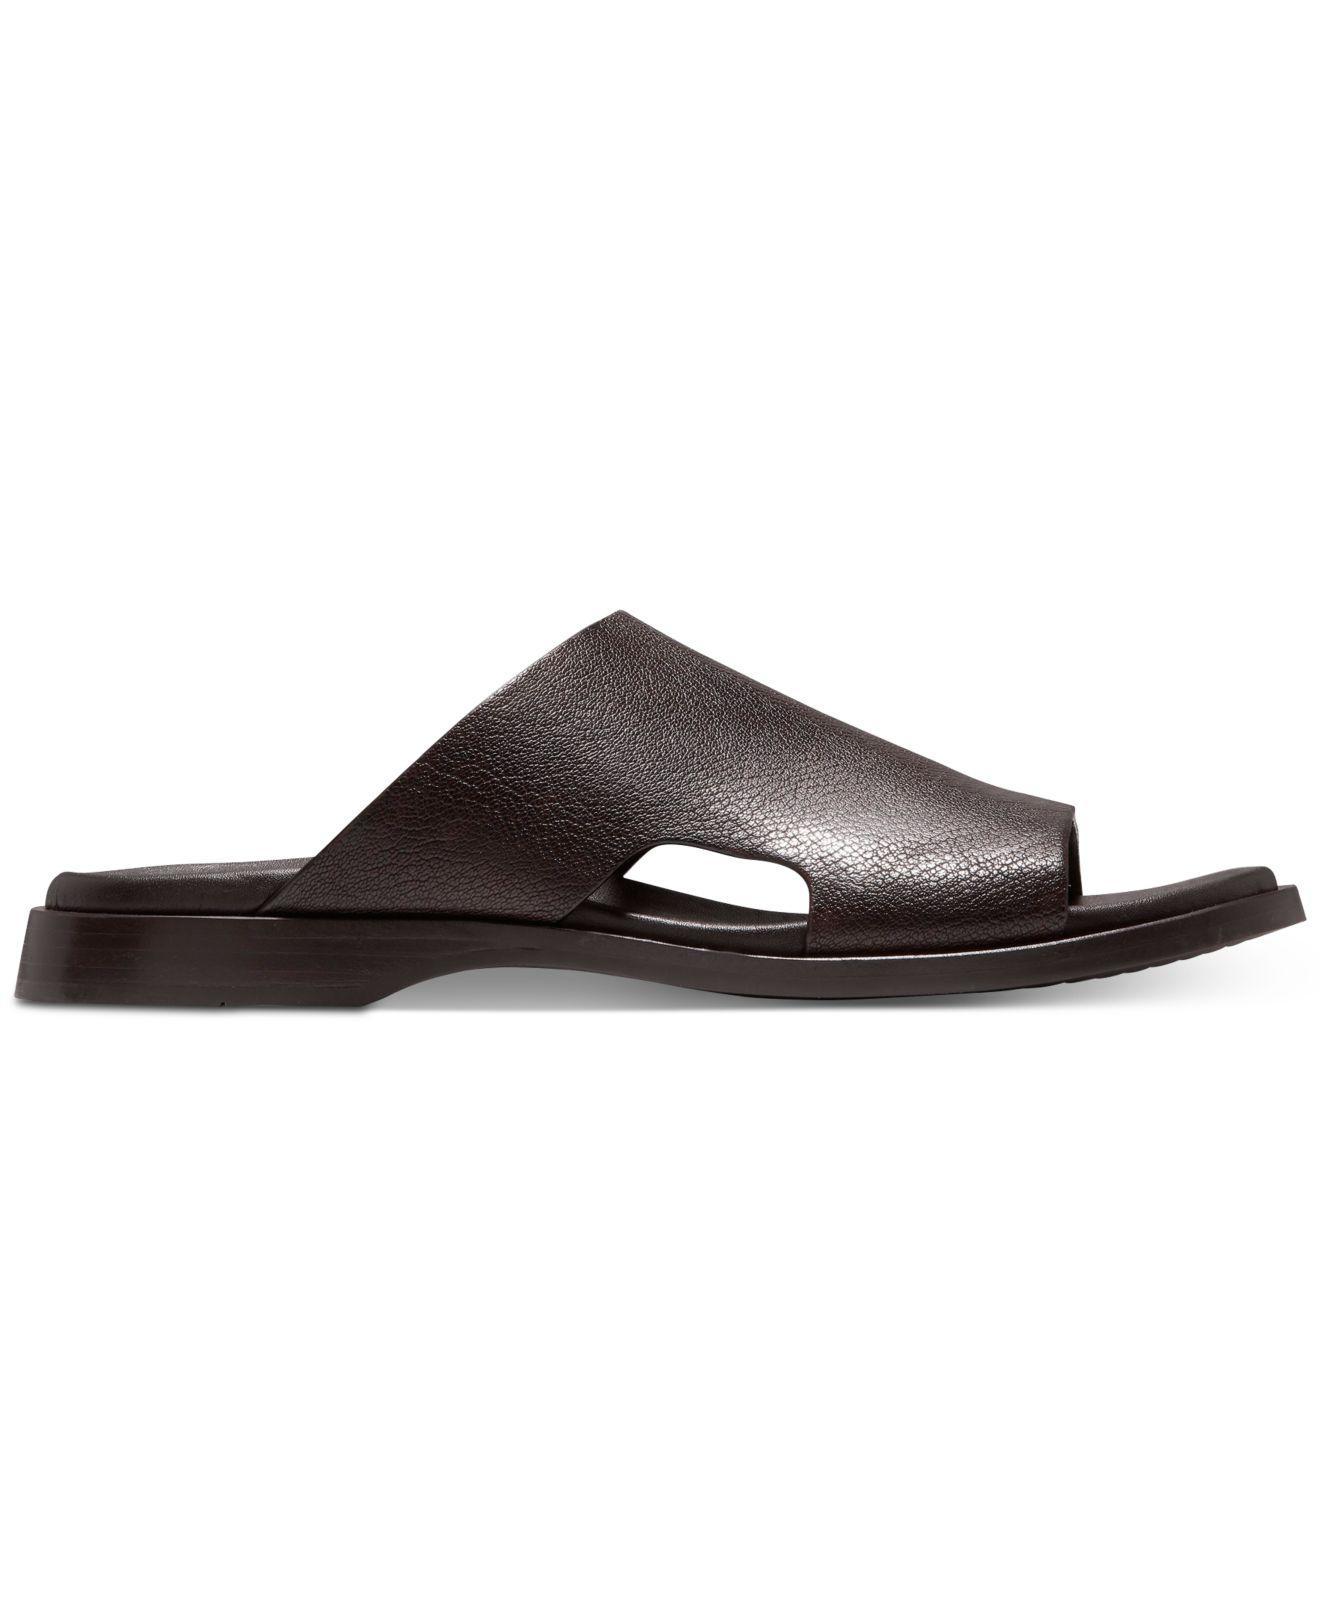 984d4de7199fd Lyst - Cole Haan Goldwyn 2.0 Slide Sandals in Brown for Men